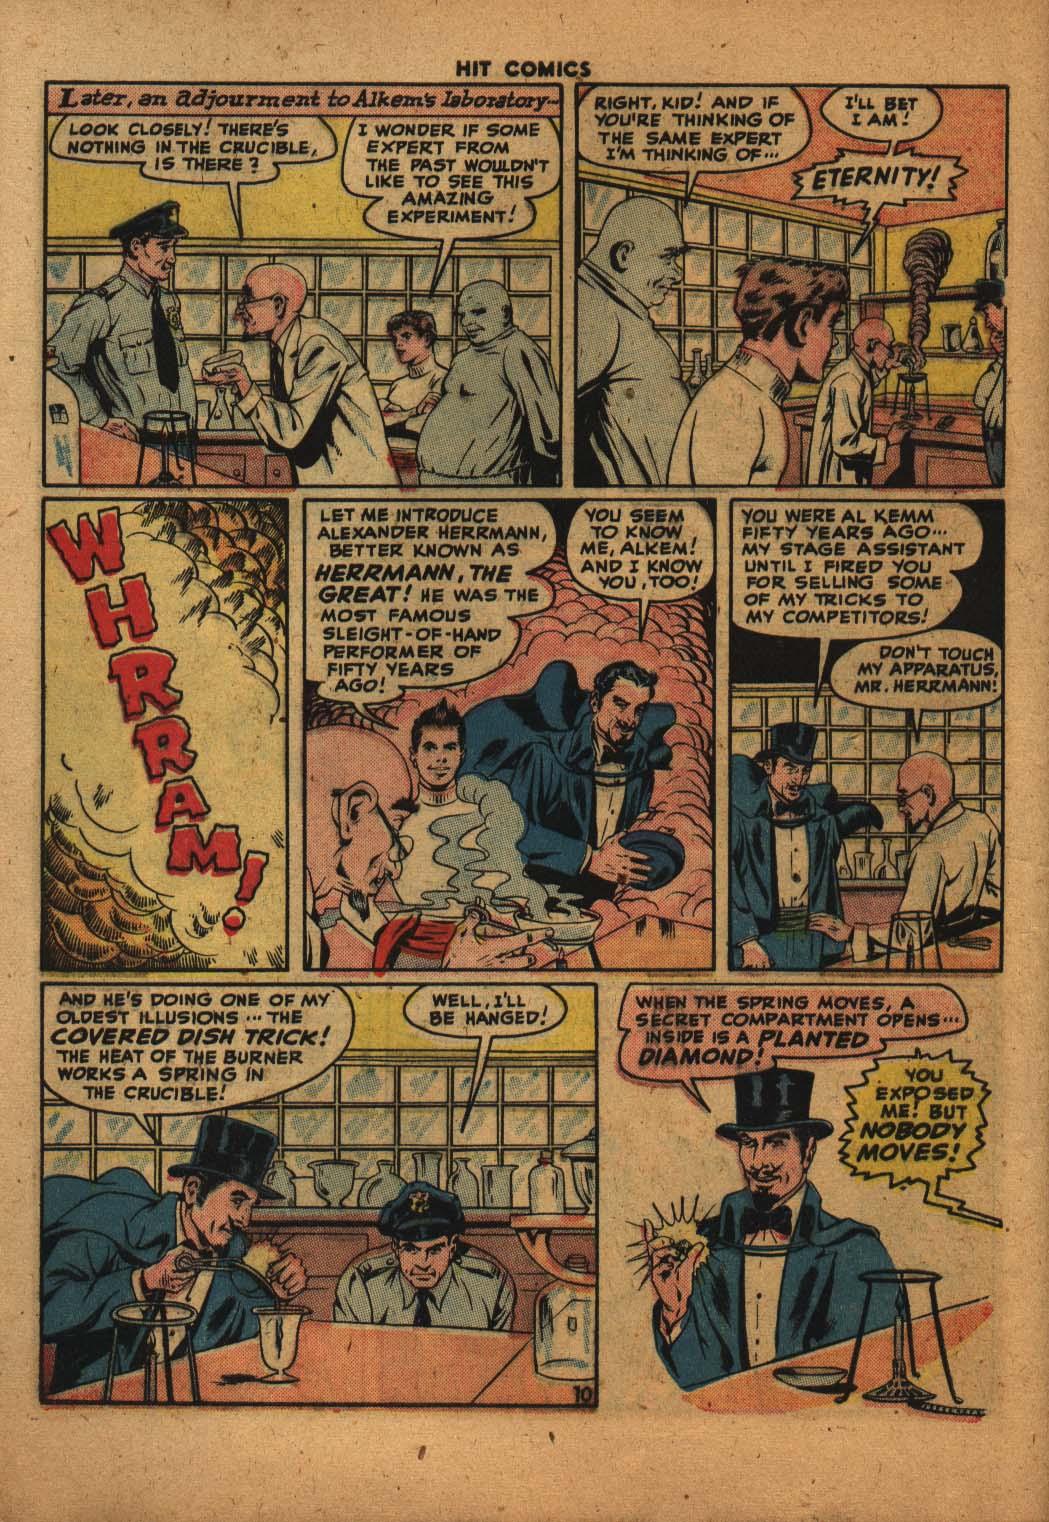 Read online Hit Comics comic -  Issue #47 - 11